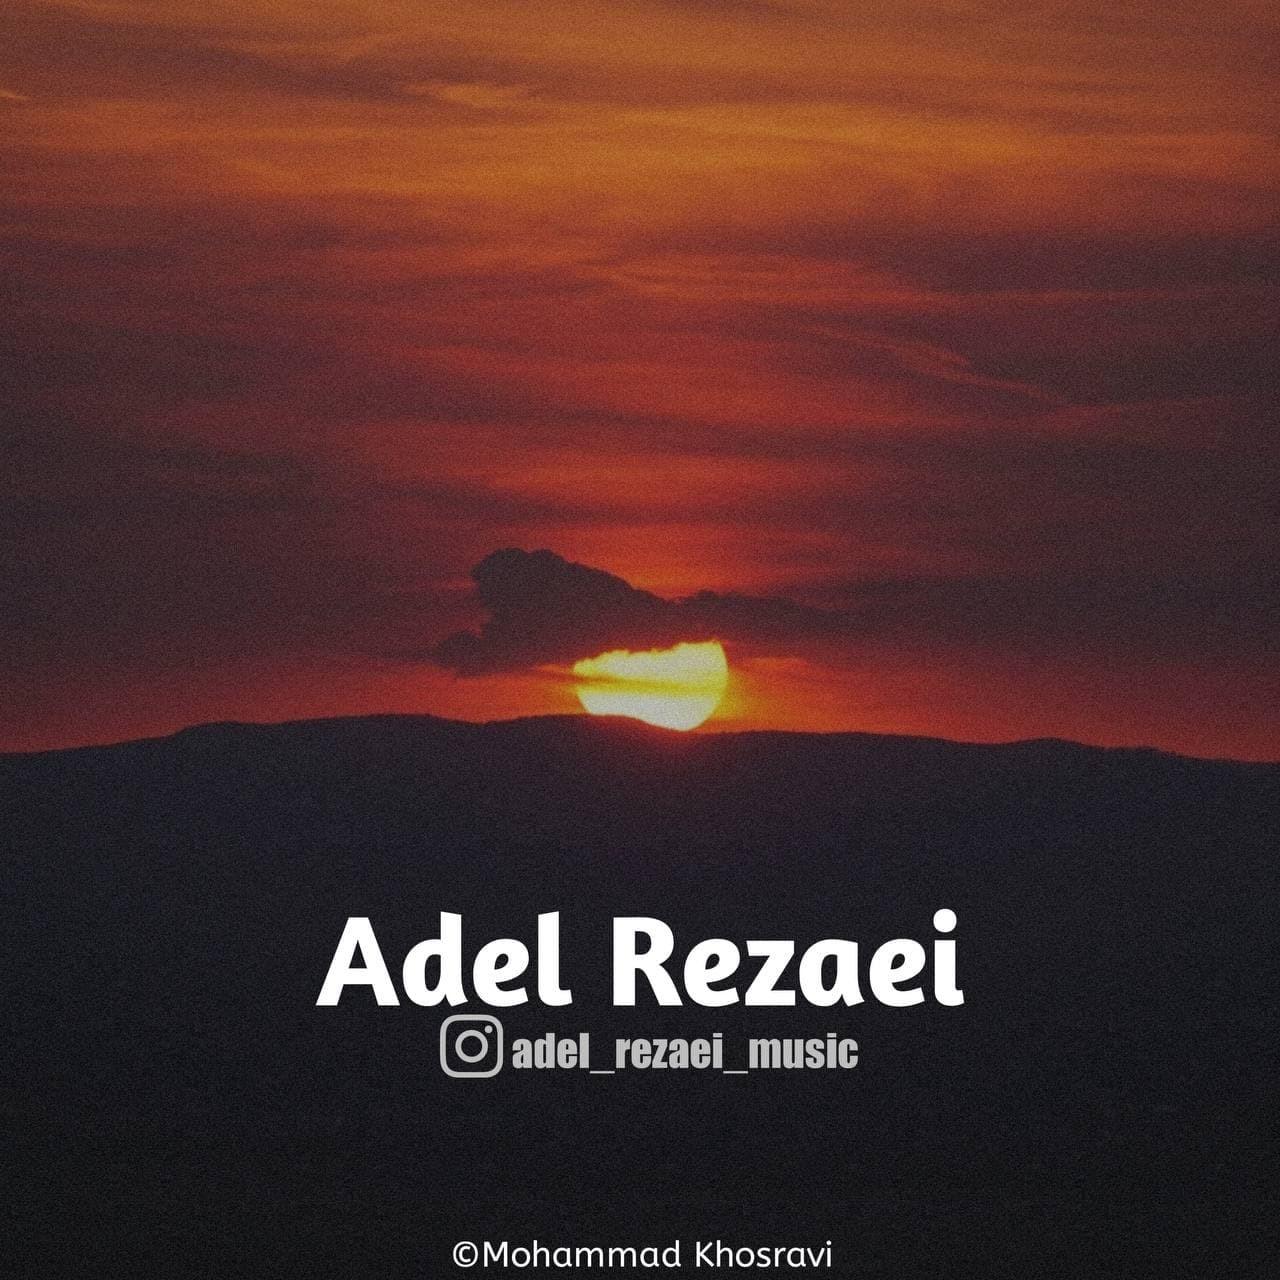 Adel Rezaei - Khorshid